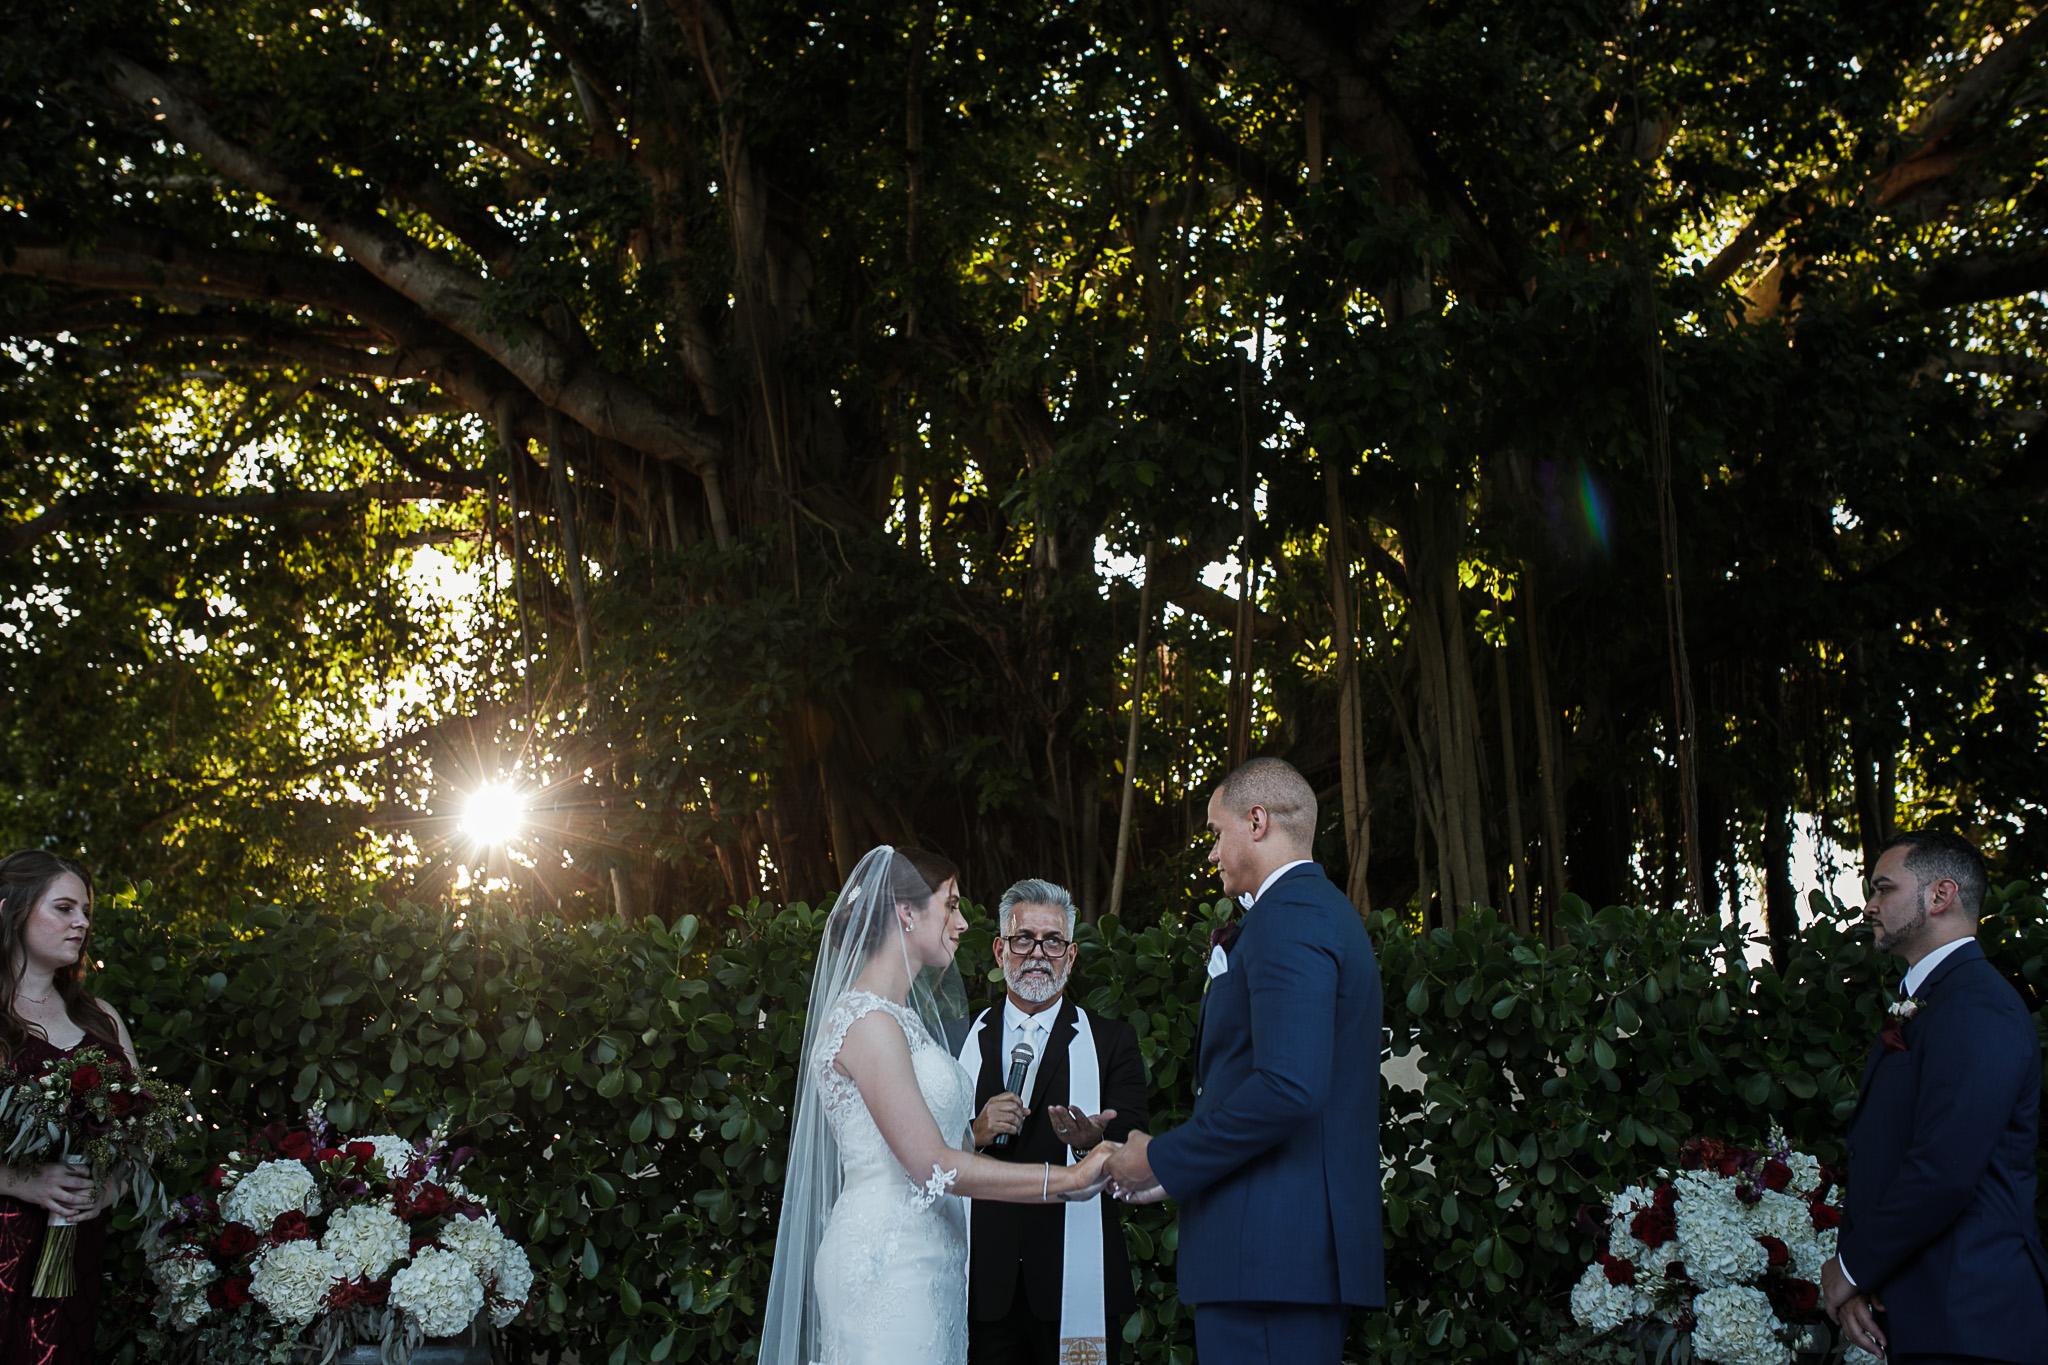 Celina-Carlin-Wedding-Sonju-photography-8.JPG